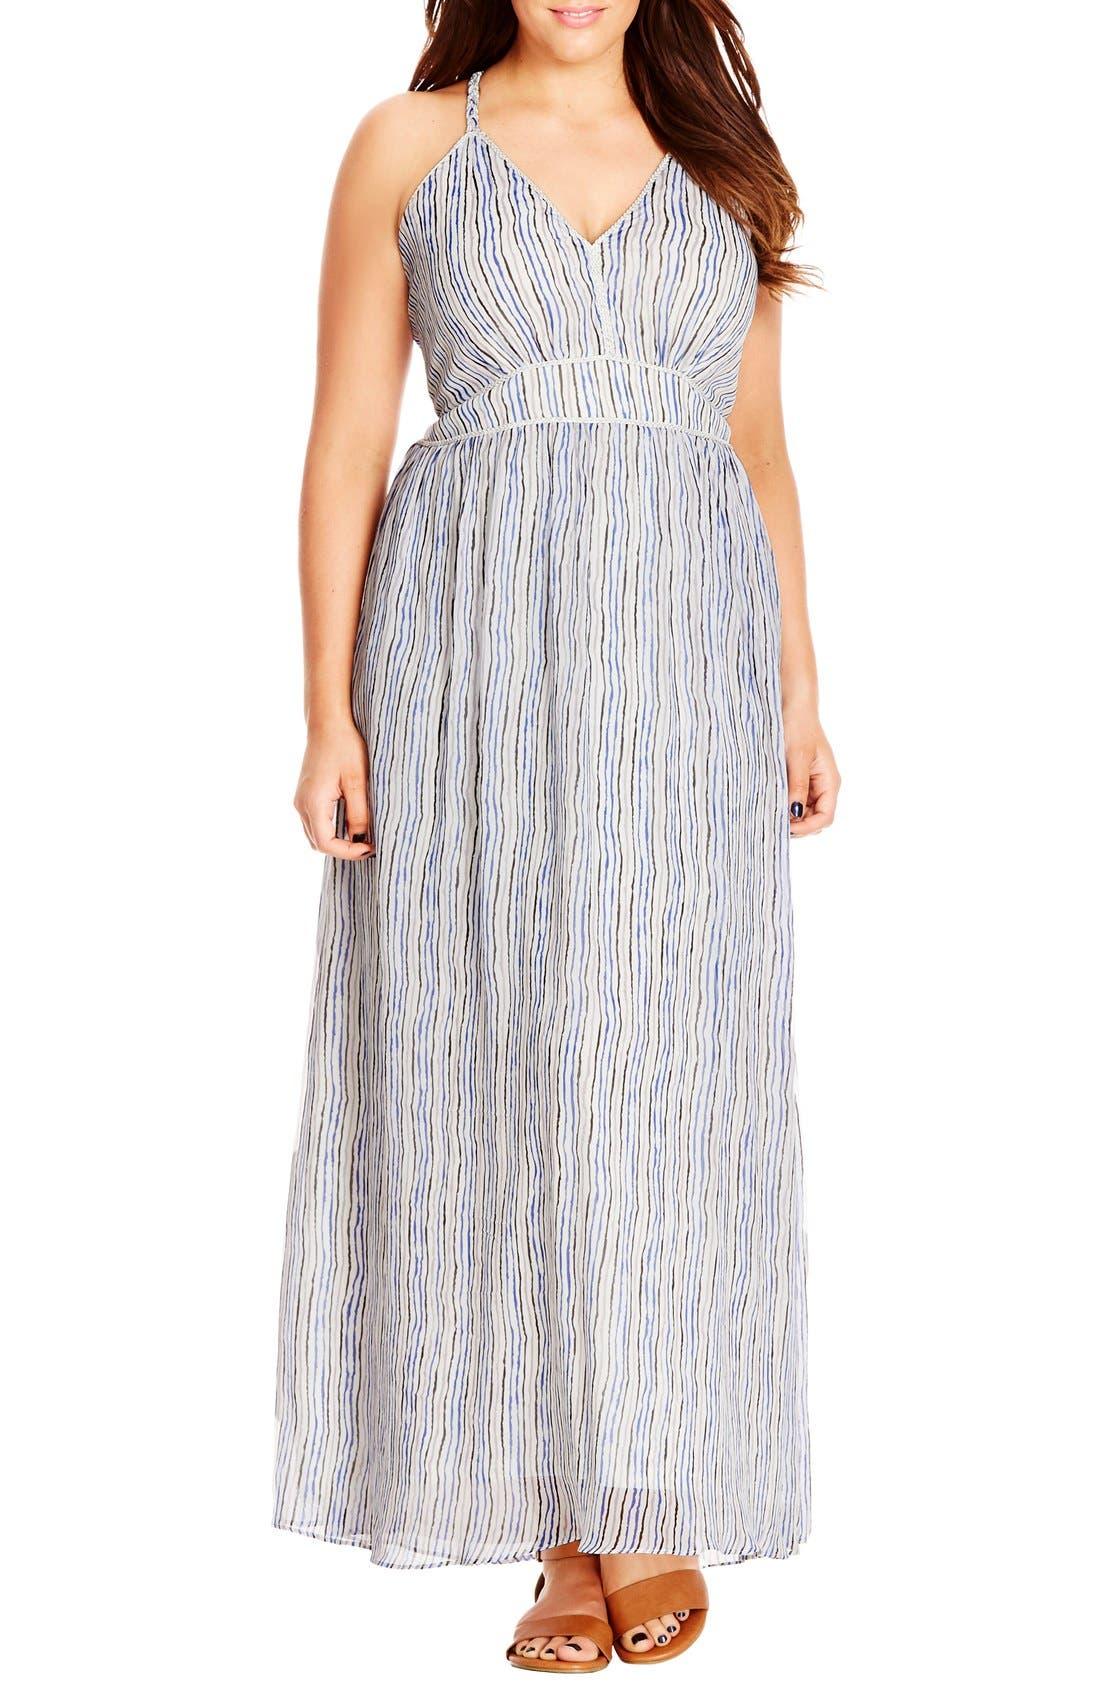 Alternate Image 1 Selected - City Chic Metallic Plait Trim Stripe Maxi Dress (Plus Size)